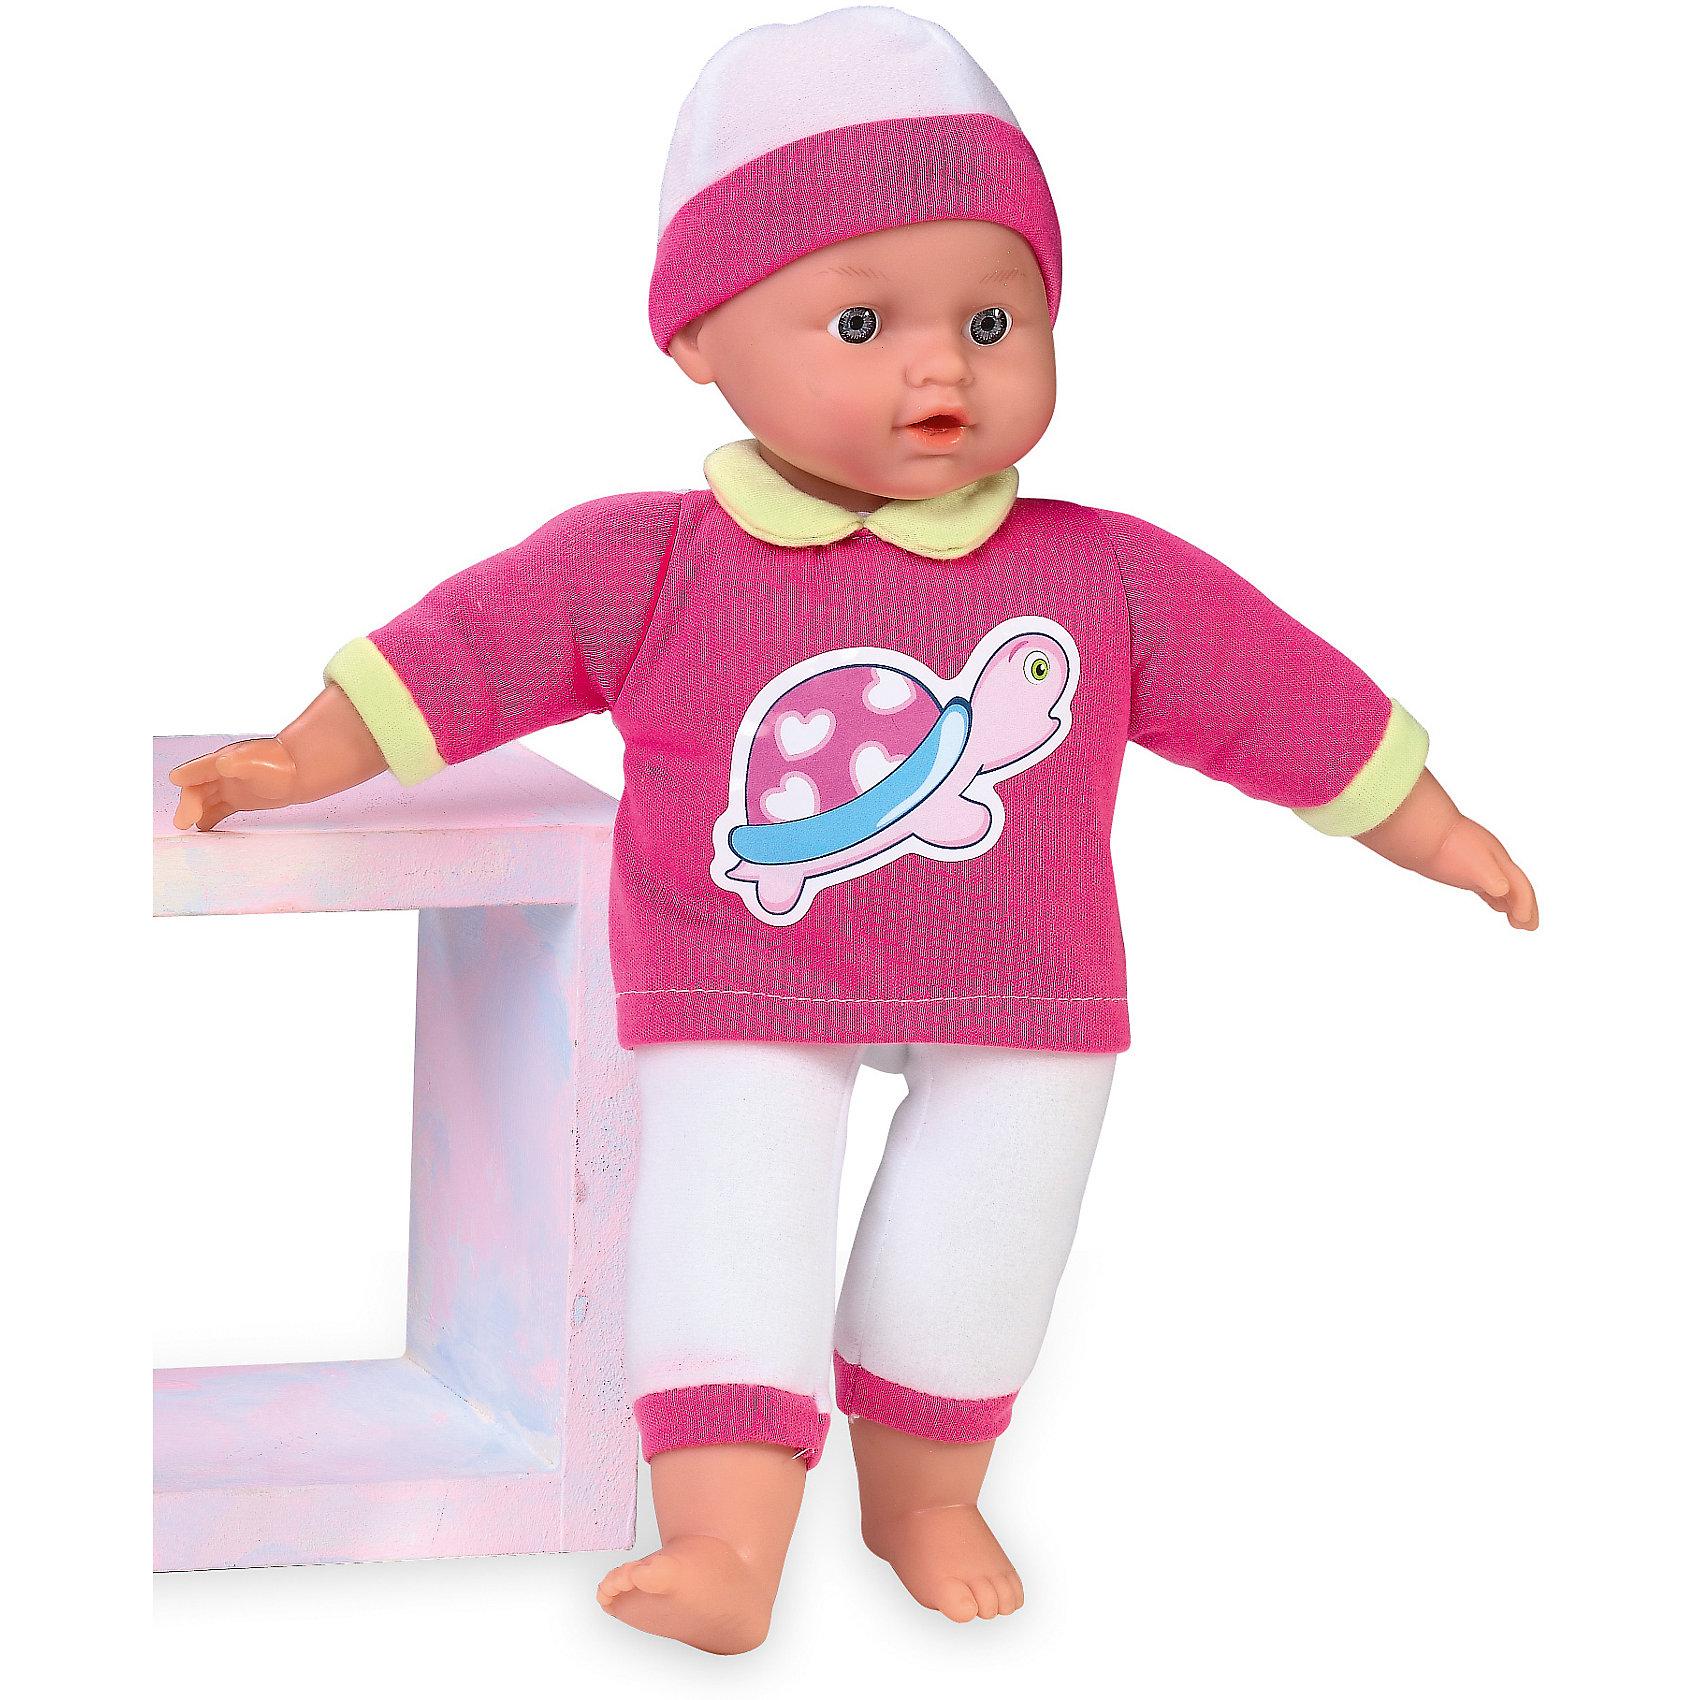 Кукла Tiny Baby, плачет, Loko ToysКуклы-пупсы<br><br><br>Ширина мм: 190<br>Глубина мм: 95<br>Высота мм: 320<br>Вес г: 430<br>Возраст от месяцев: 10<br>Возраст до месяцев: 2147483647<br>Пол: Женский<br>Возраст: Детский<br>SKU: 6759064